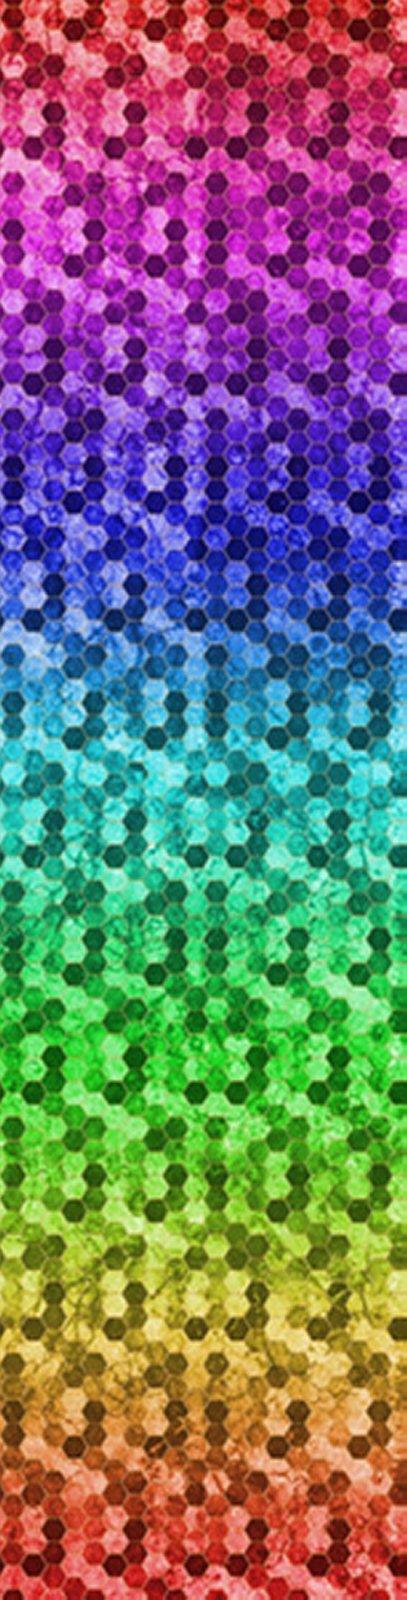 Backsplash - Rainbow - By Hoffman Fabrics